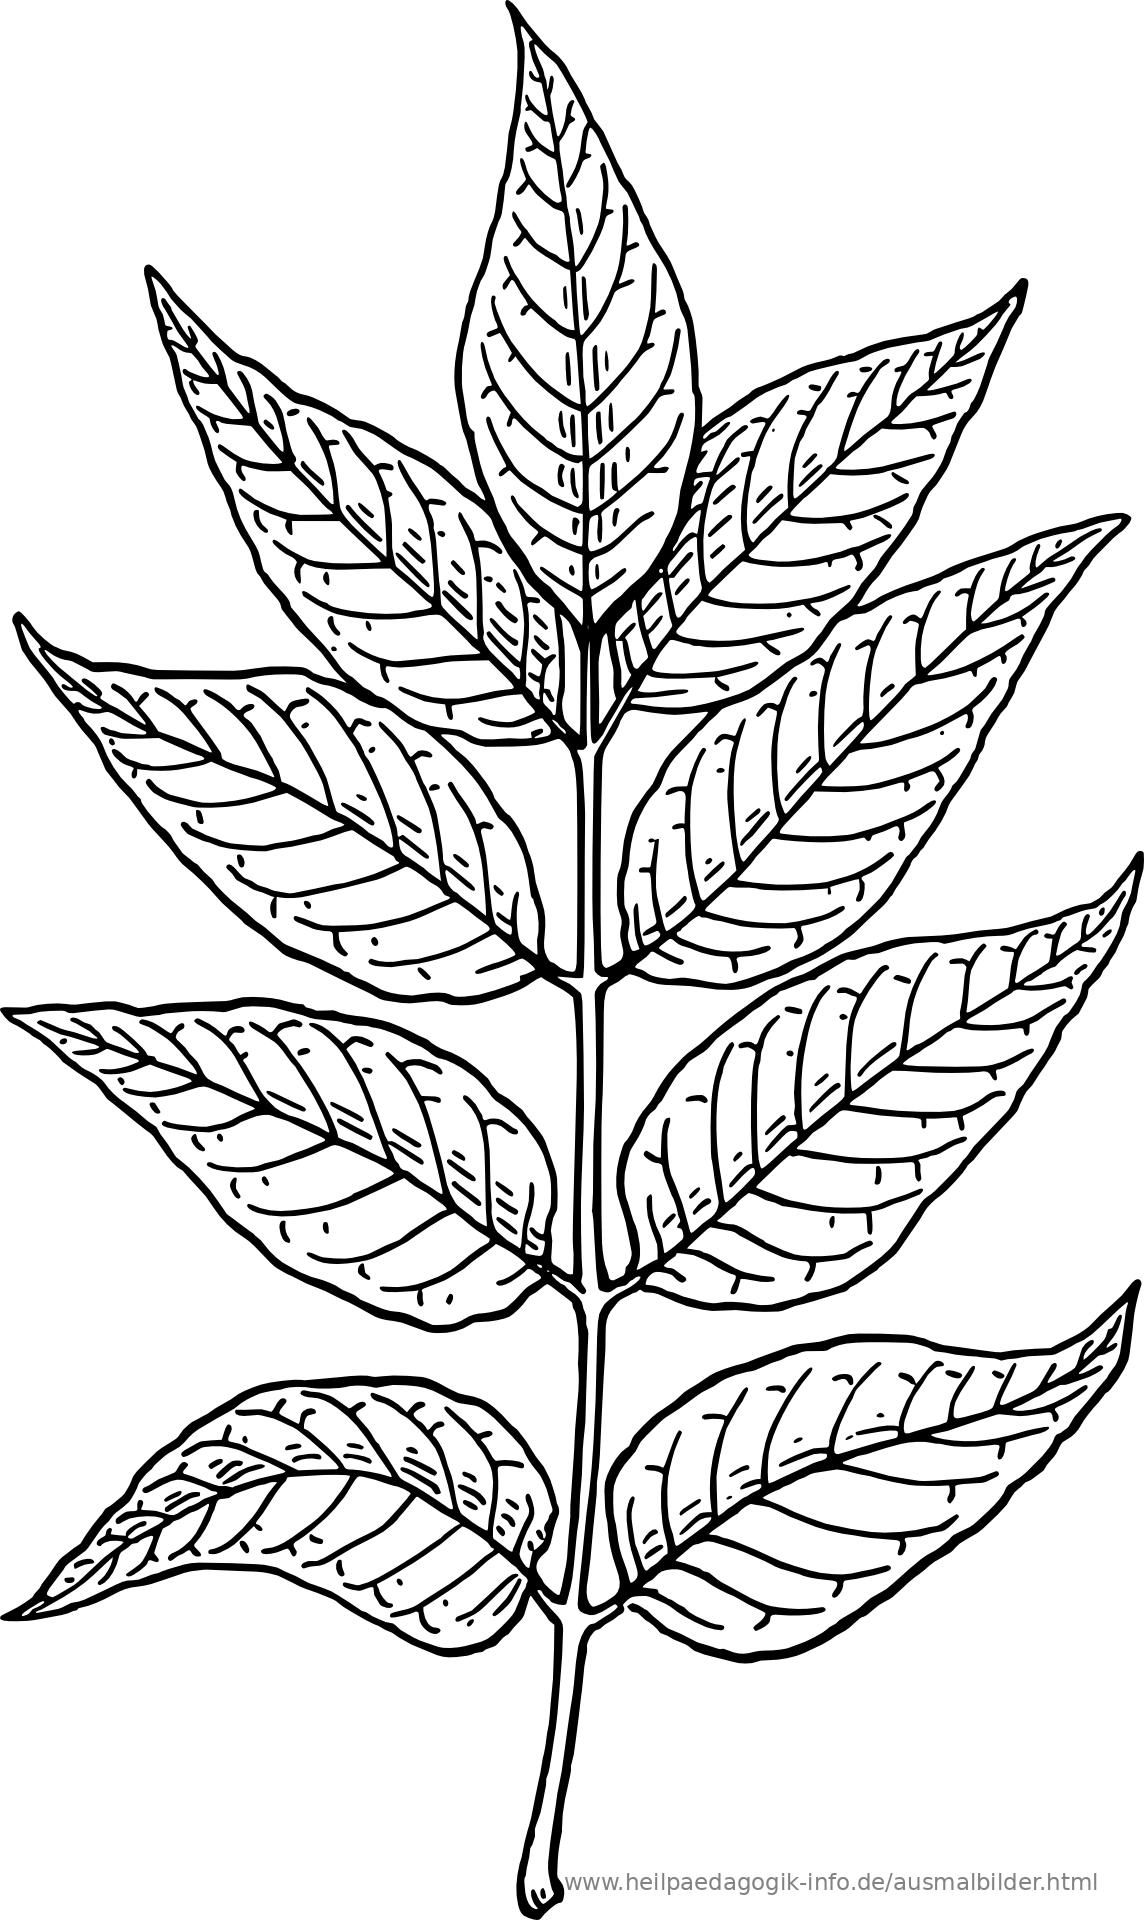 Ausmalbilder Blumen Bäume Blätter